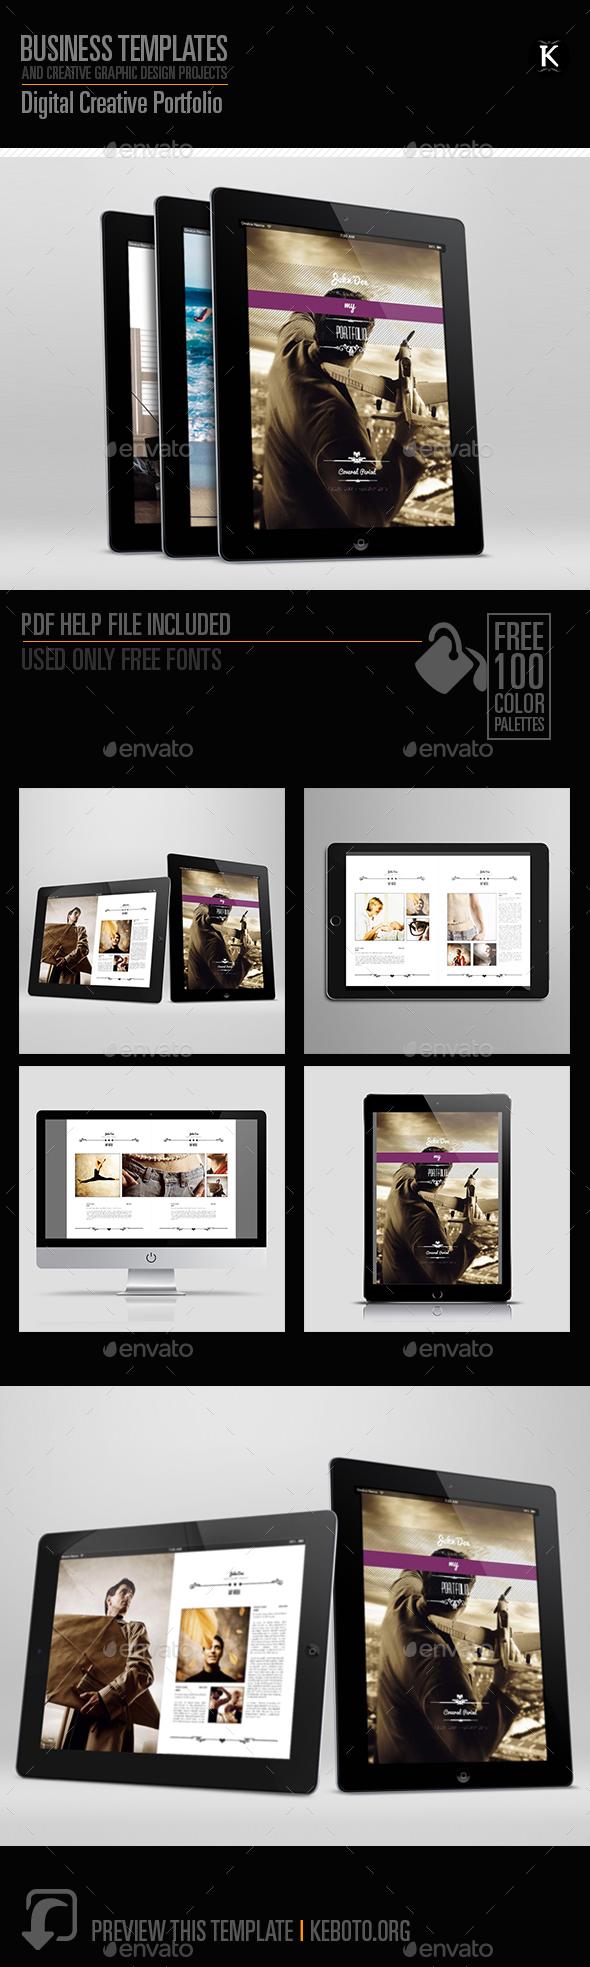 Digital Creative Portfolio Template - ePublishing